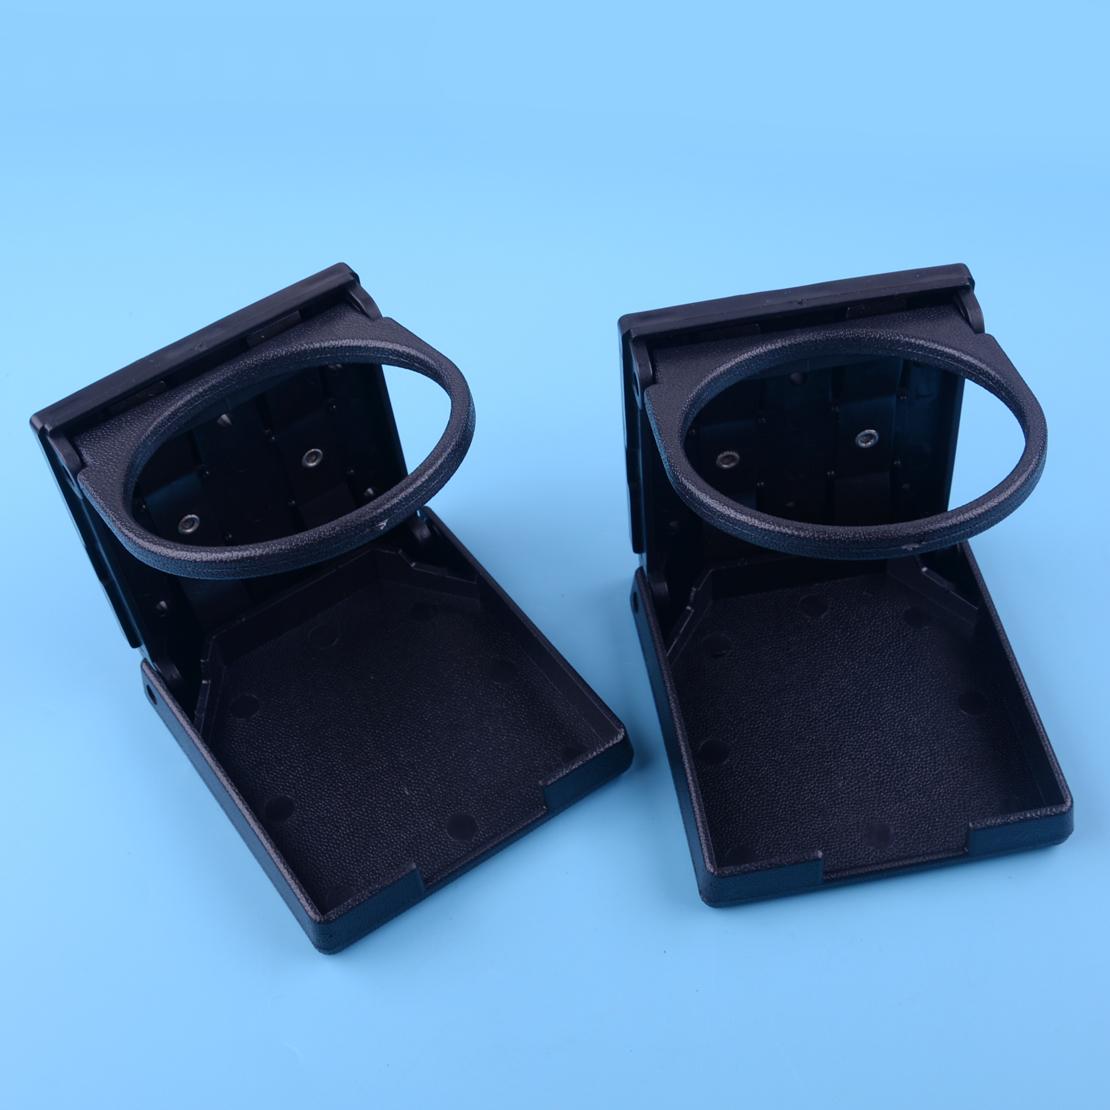 Dual Adjustable Folding Drink Cup Holder For Boat Marine Car RV Truck SUV Van UK